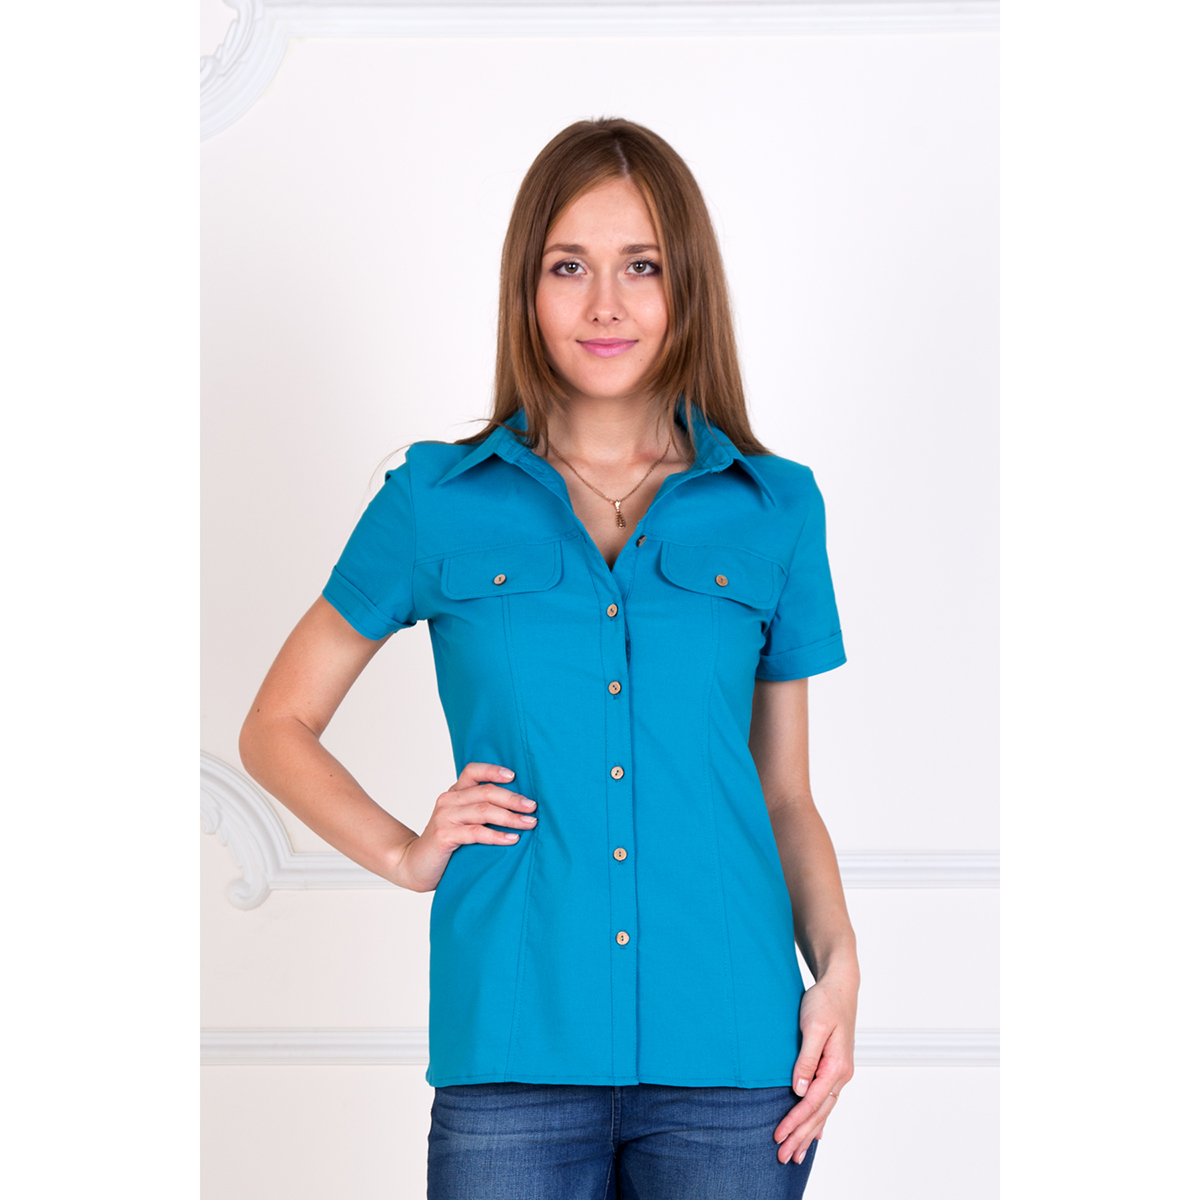 Женская рубашка Александра Голубой, размер 42Рубашки<br>Обхват груди: 84 см <br>Обхват талии: 65 см <br>Обхват бедер: 92 см <br>Рост: 167 см<br><br>Тип: Жен. рубашка<br>Размер: 42<br>Материал: Хлопок